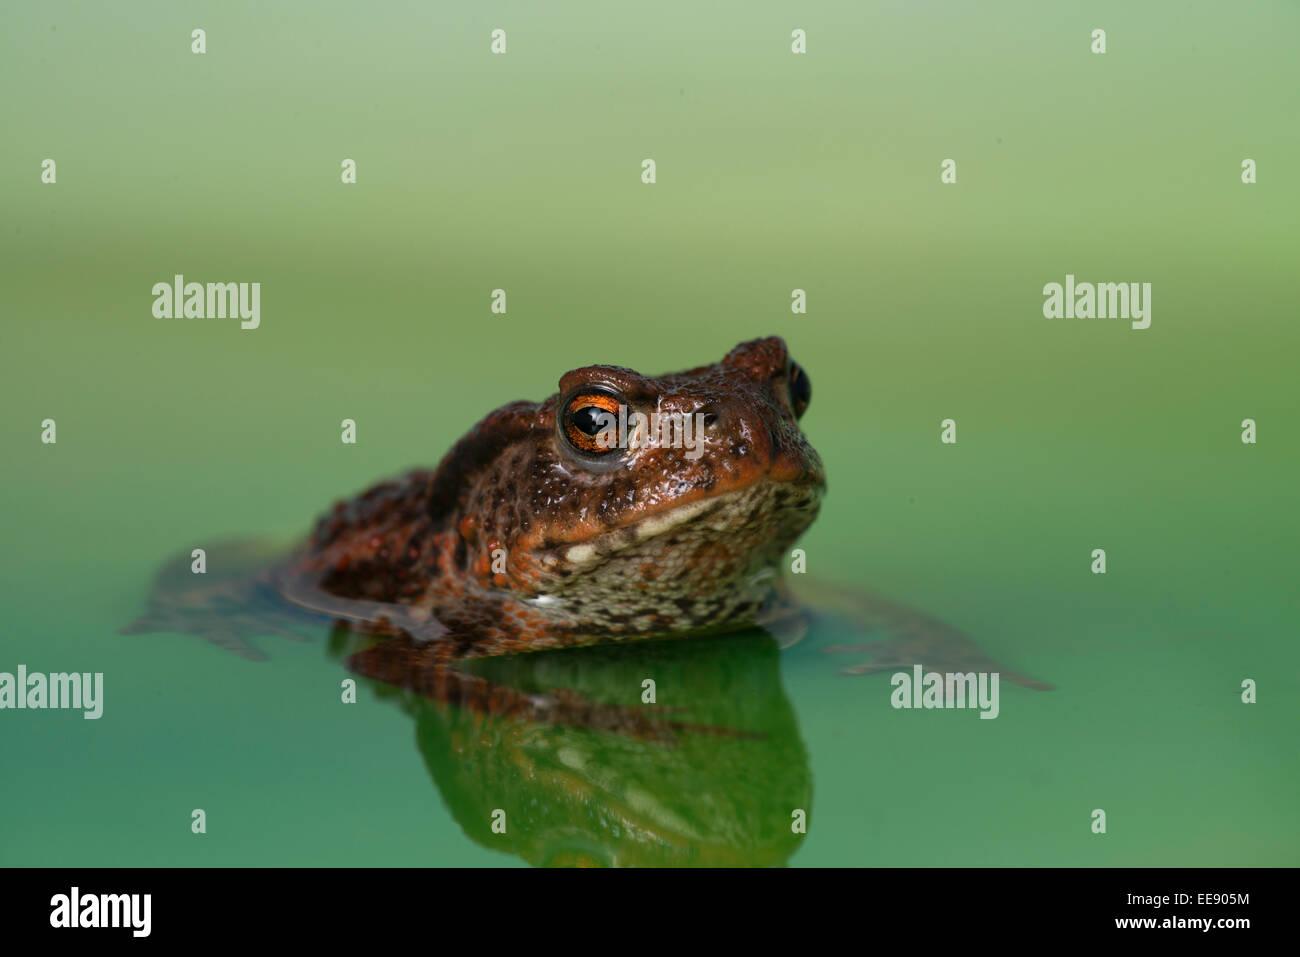 common european toad [Bufo bufo] Stock Photo